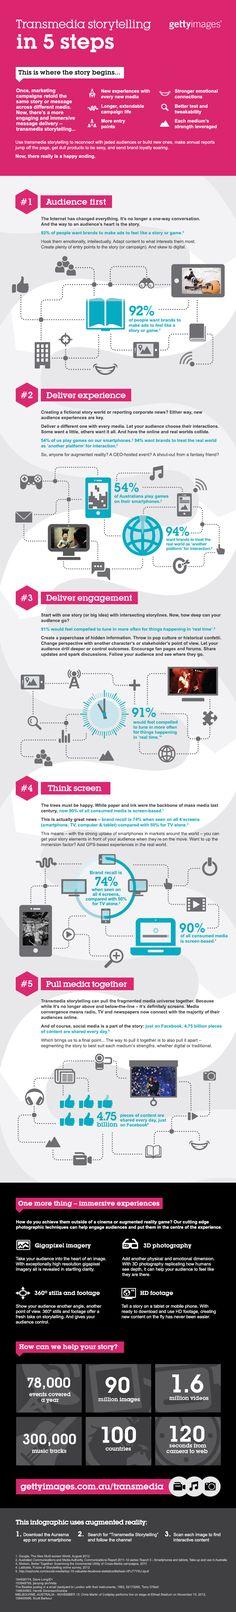 [Infographic] Transmedia storytelling in 5 steps